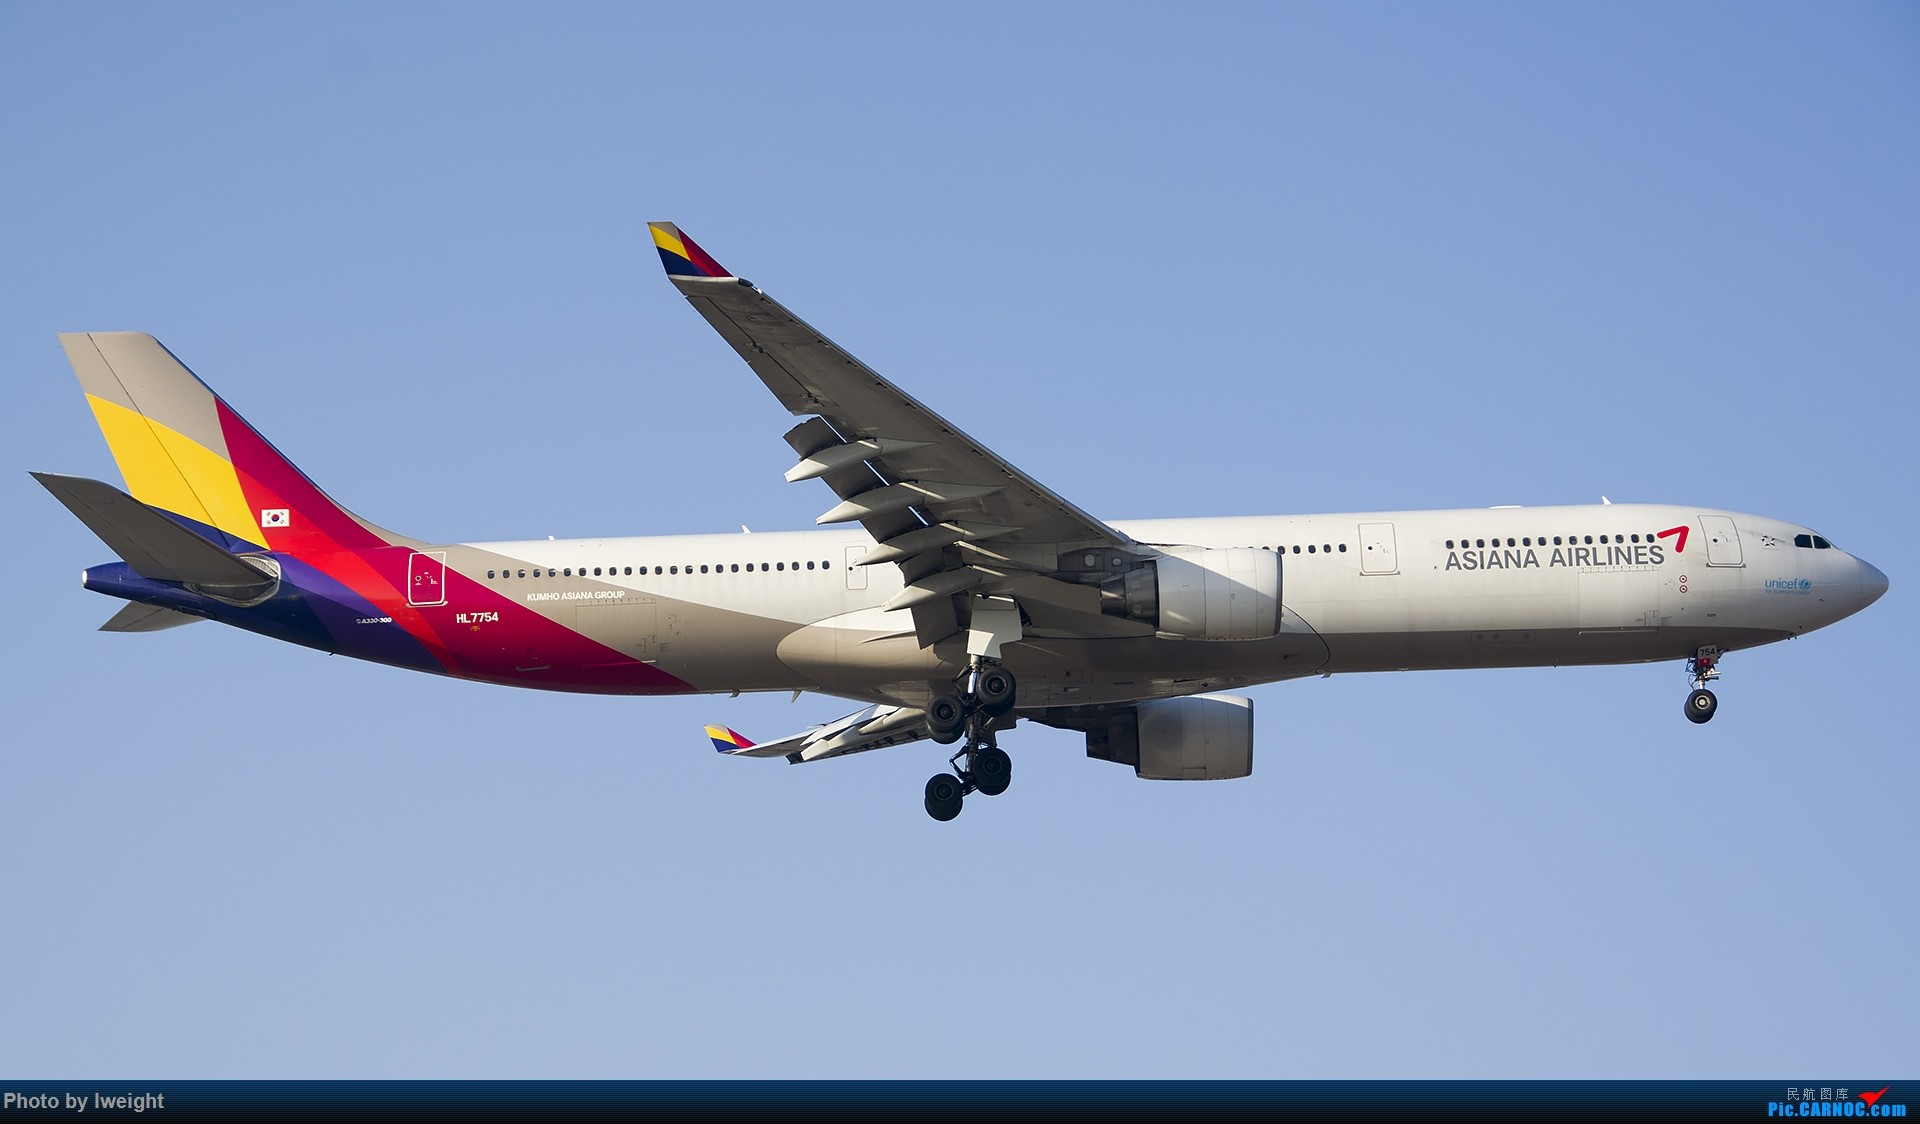 Re:[原创]庆祝升级777,发上今天在首都机场拍的所有飞机【2014-12-14】 AIRBUS A330-300 HL7754 中国北京首都国际机场